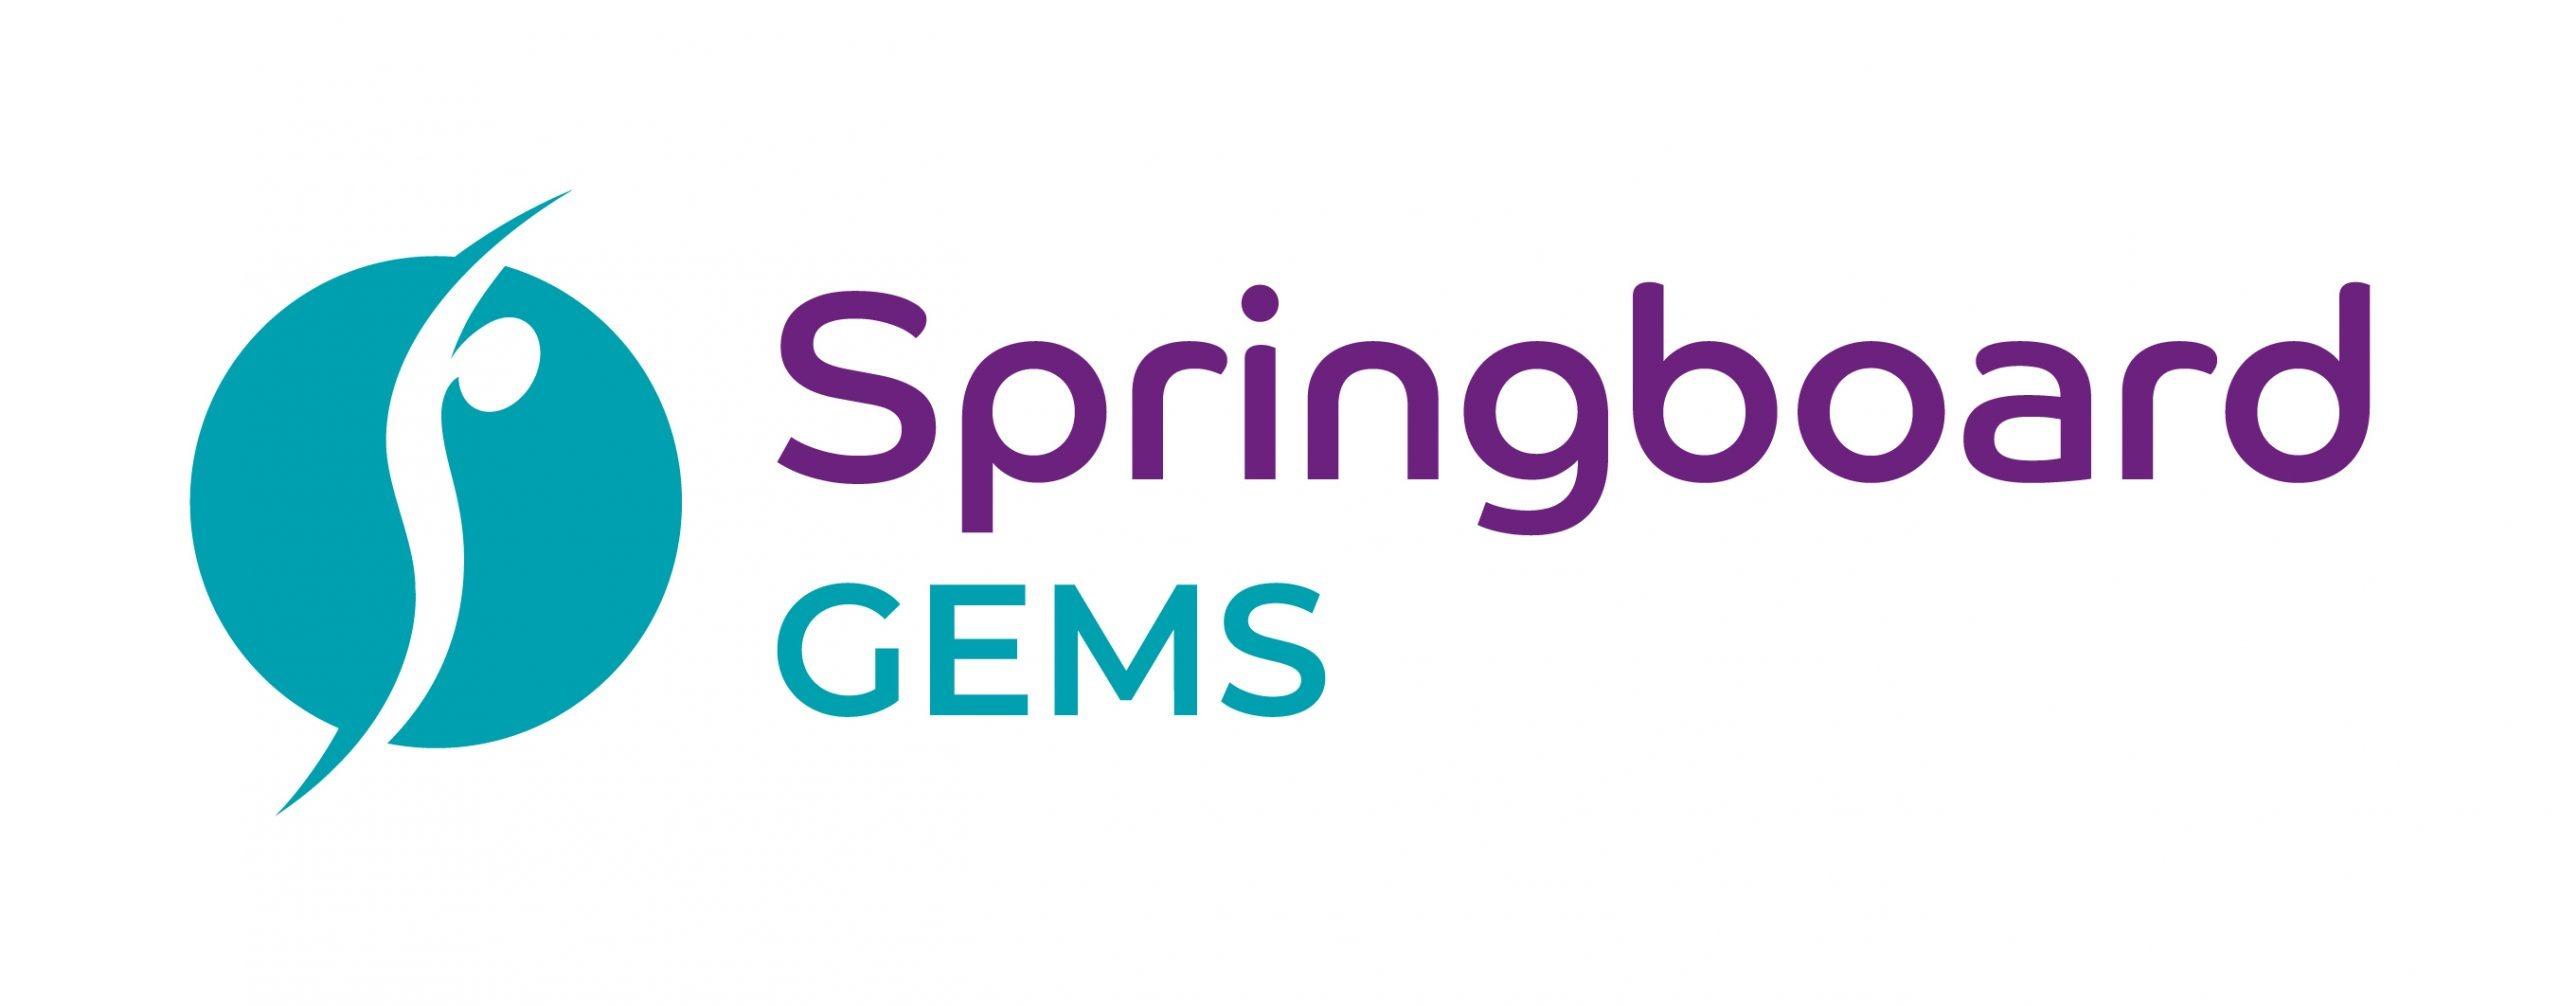 Springboard GEMS Logo